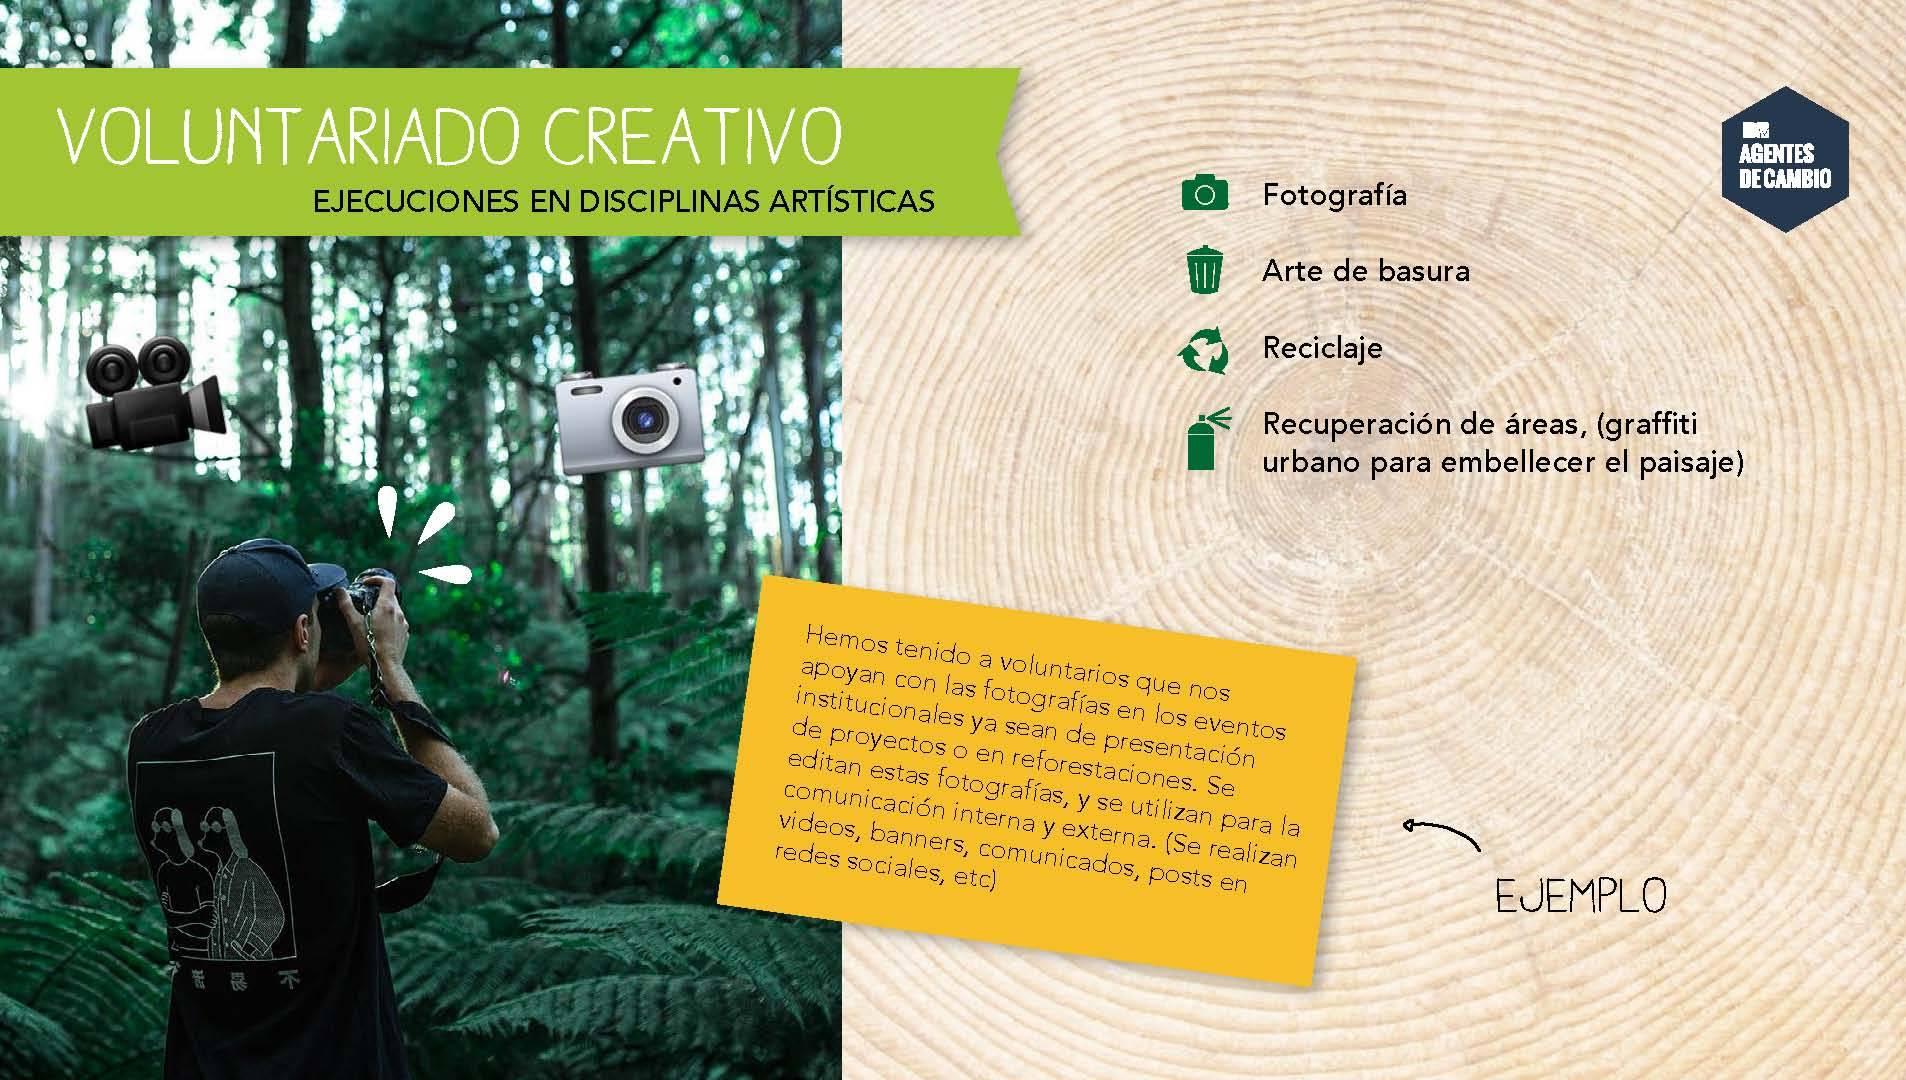 mgid:file:gsp:scenic:/international/mtvla.com-new/articulos/2016/abril/26/reforestamos_mexico_1_Page_07.jpg